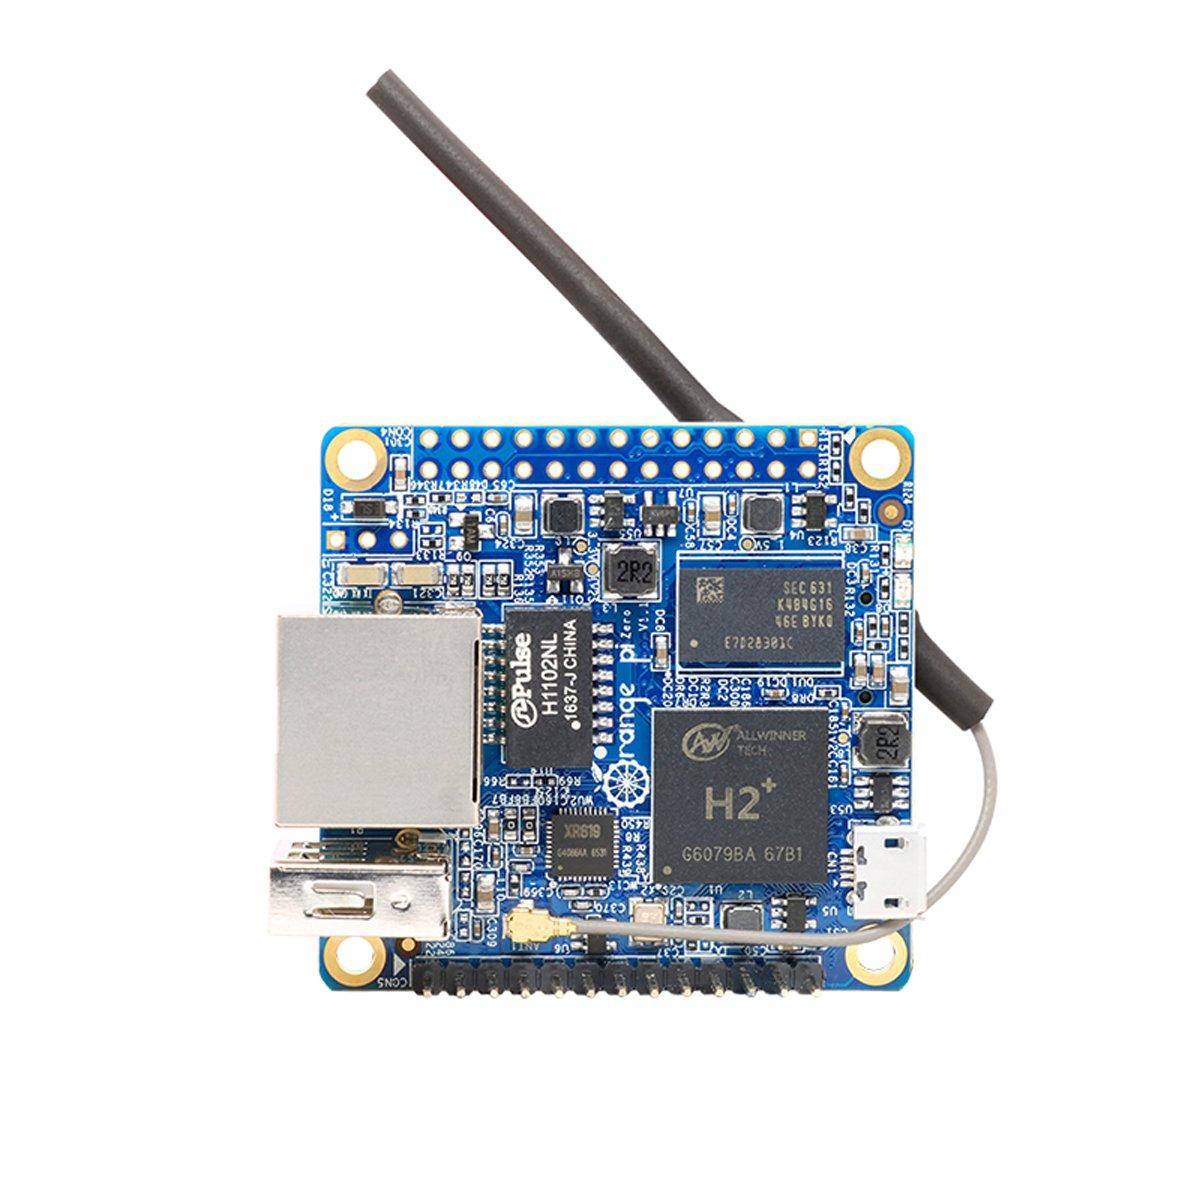 Makerfocus Orange Pi Zero H2 Quad Core Open-source 256MB Development Board with Wifi Antenna by MakerFocus (Image #1)